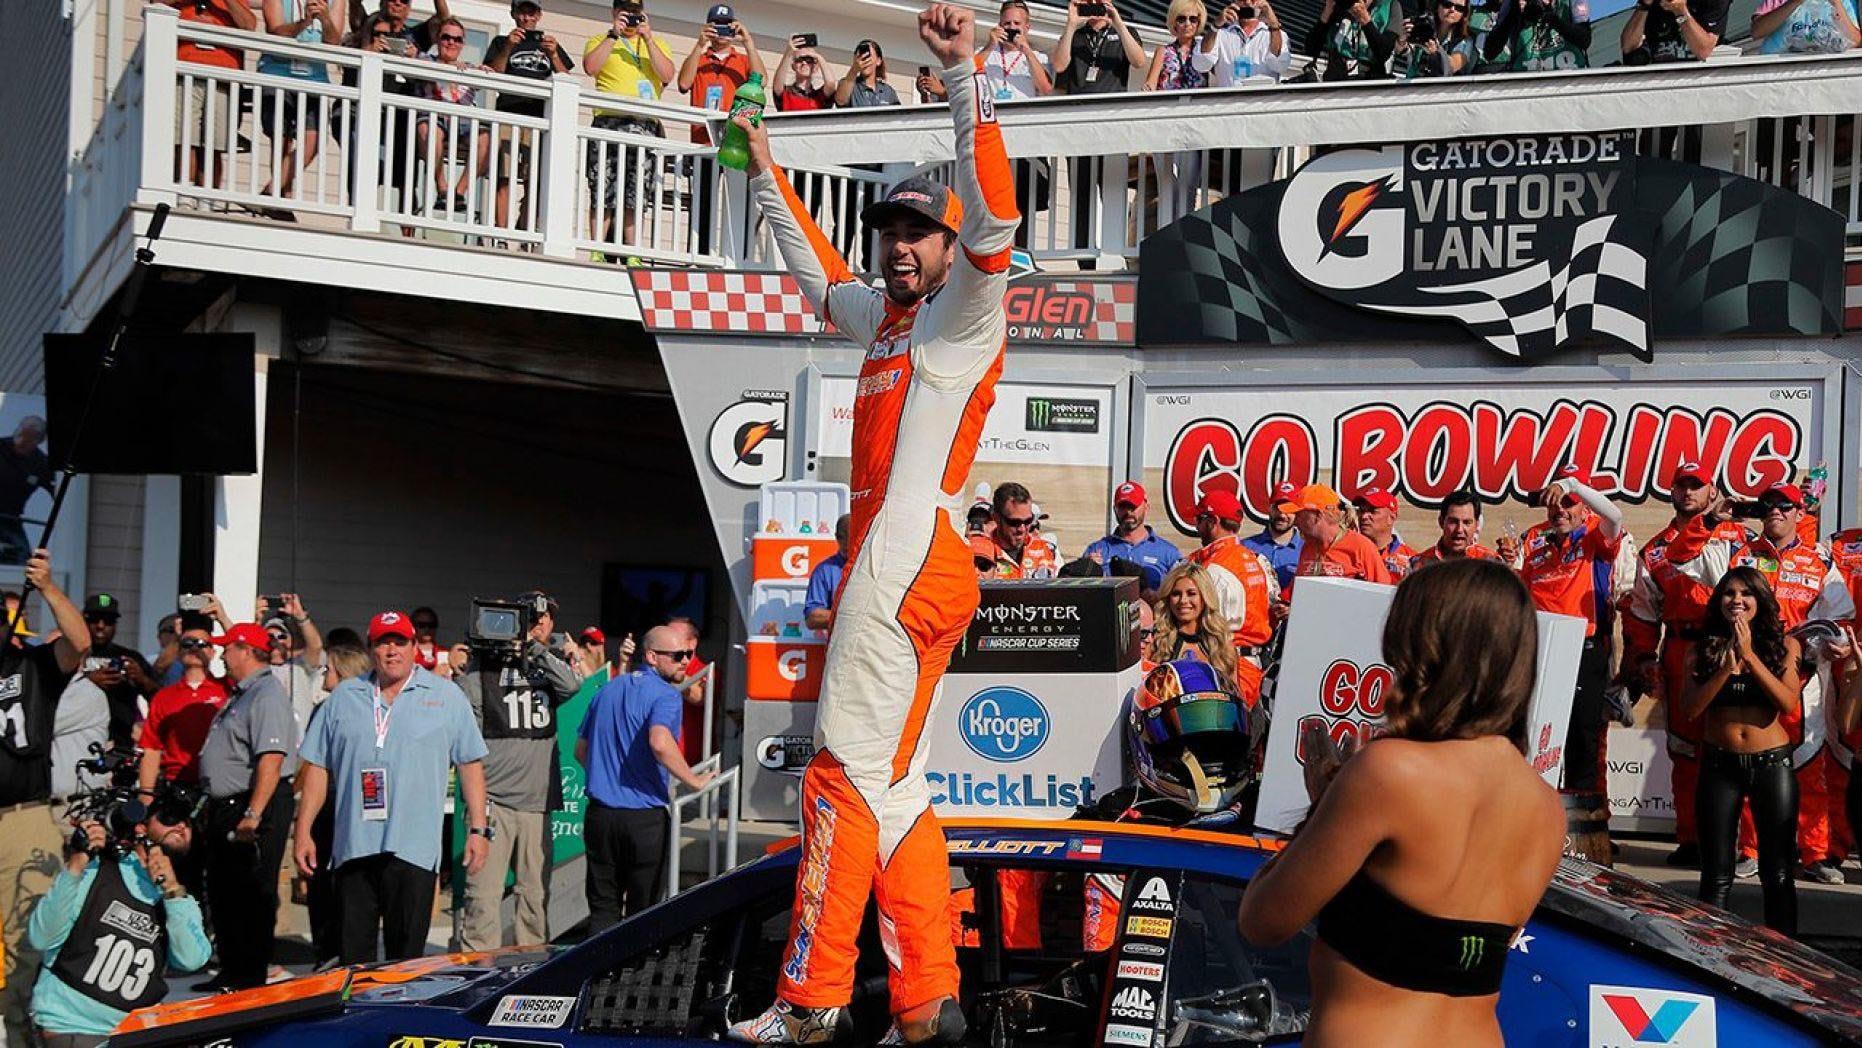 Elliott scored his first win at Watkins Glen.